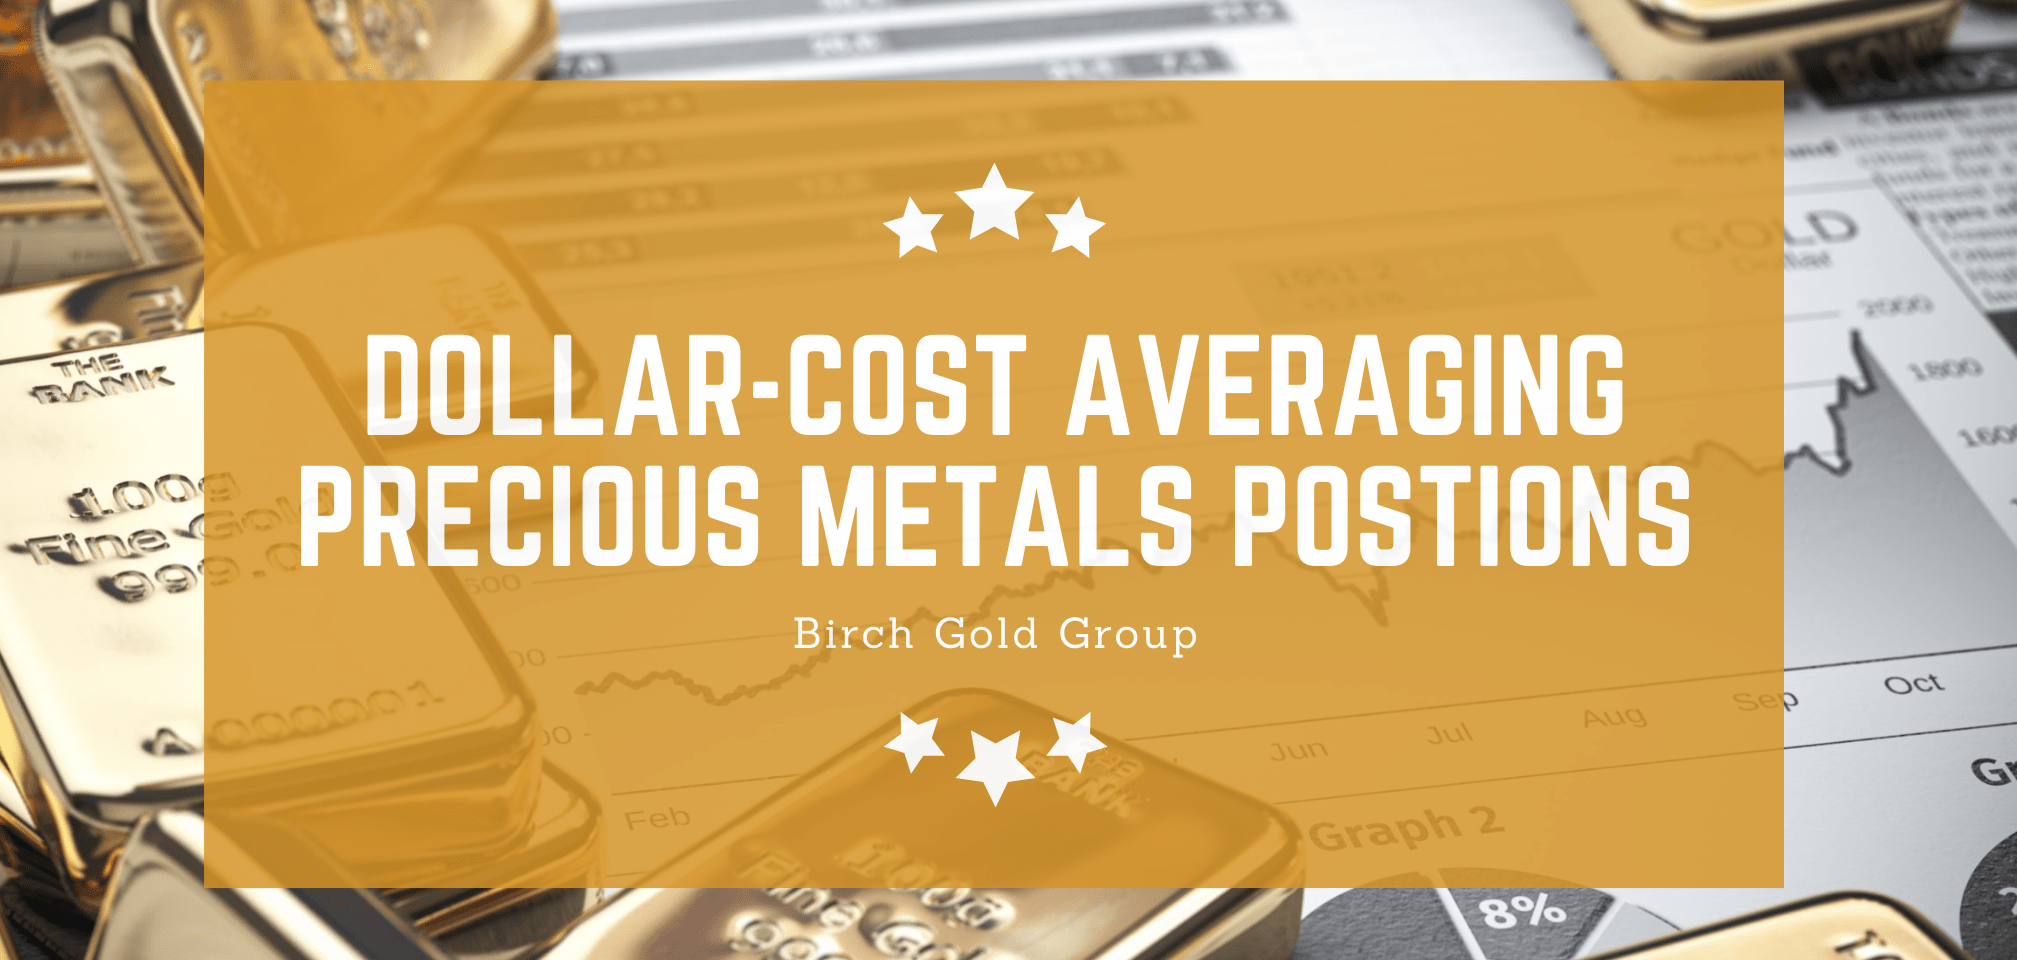 Dollar-Cost Averaging Precious Metals Positions Hero Image